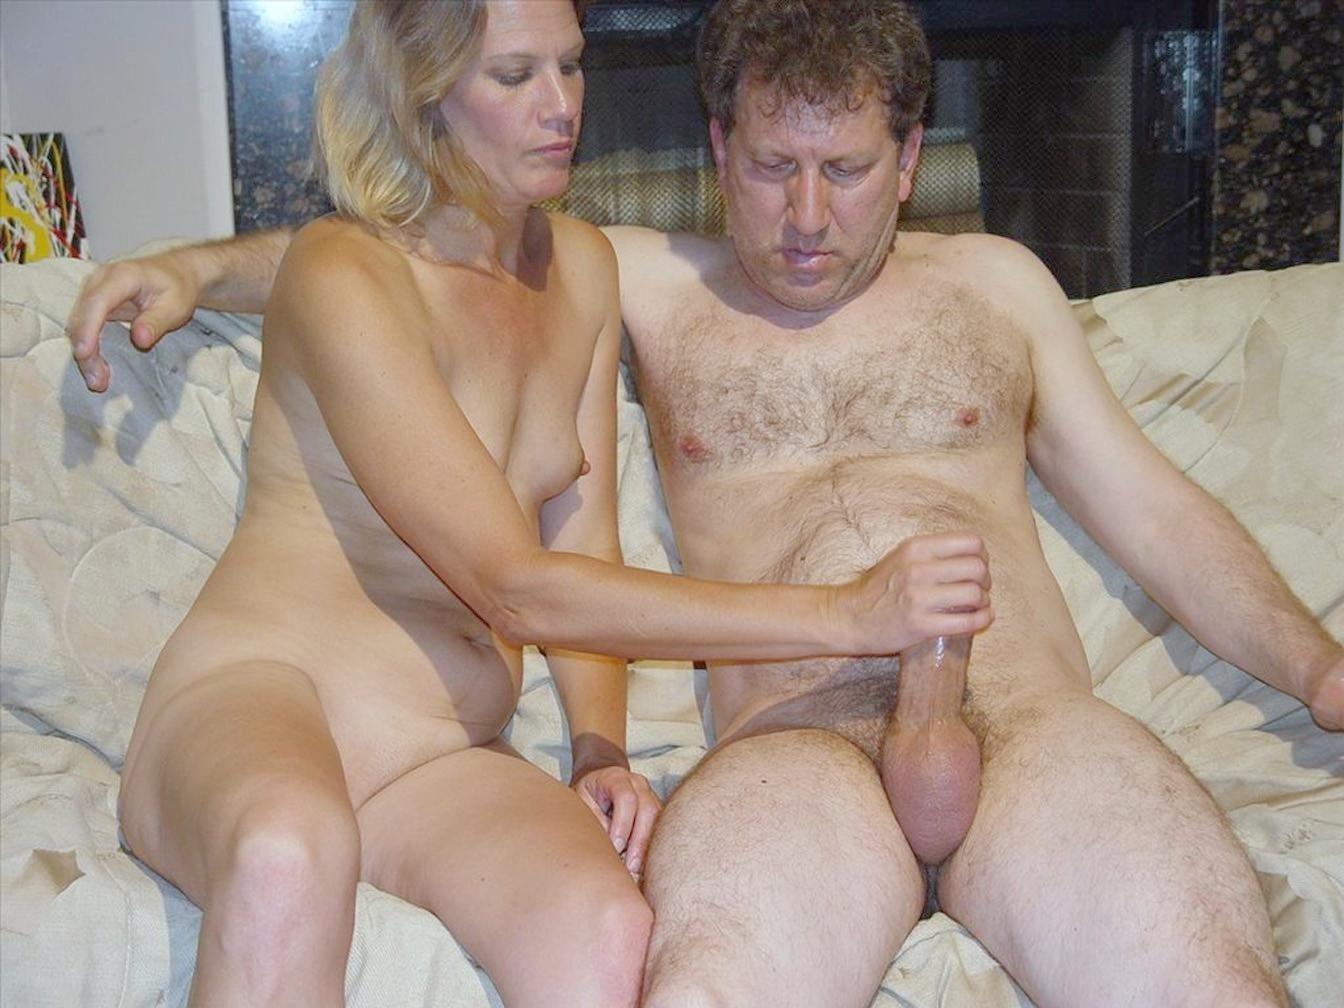 Wives posing naked